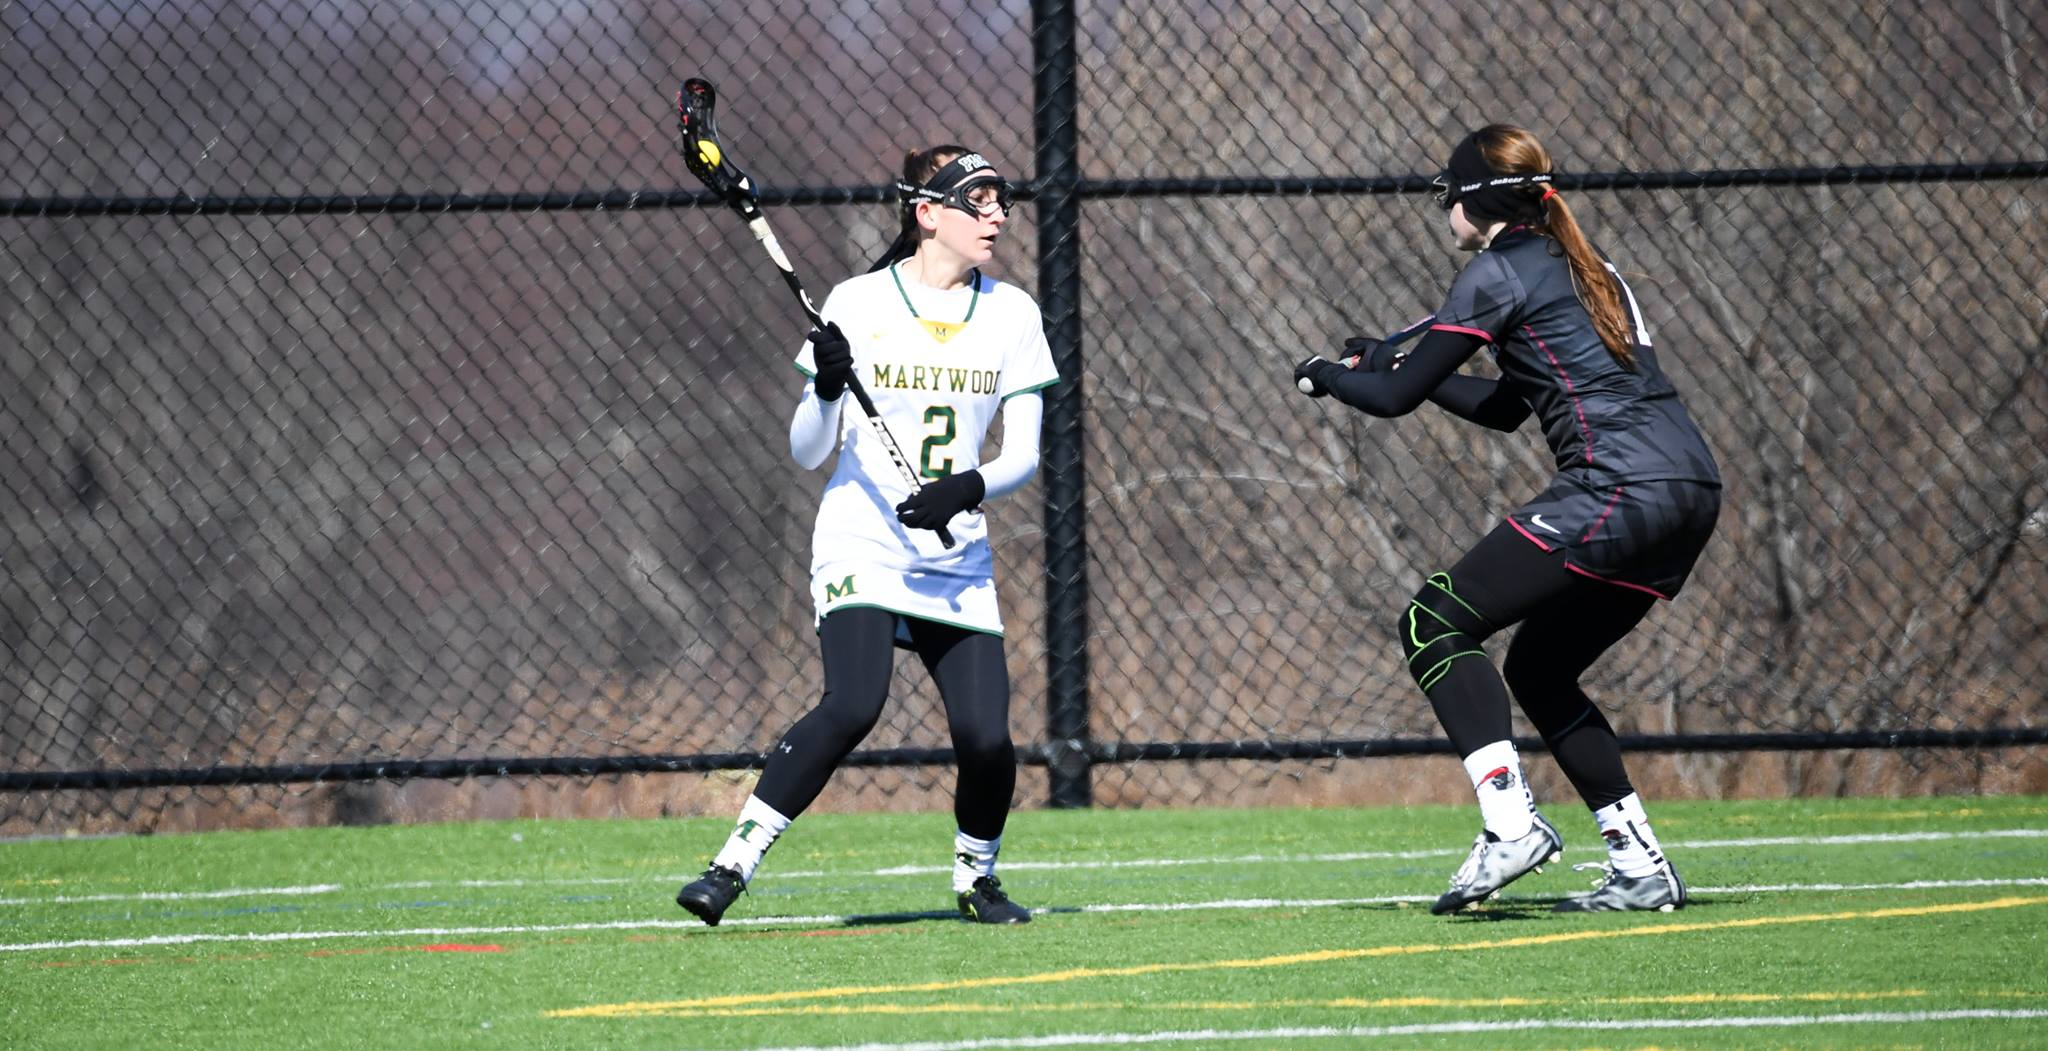 Junior attacker Erin Healy looks to make a play against Arcadia University. Photo courtesy of Marywood Athletics.